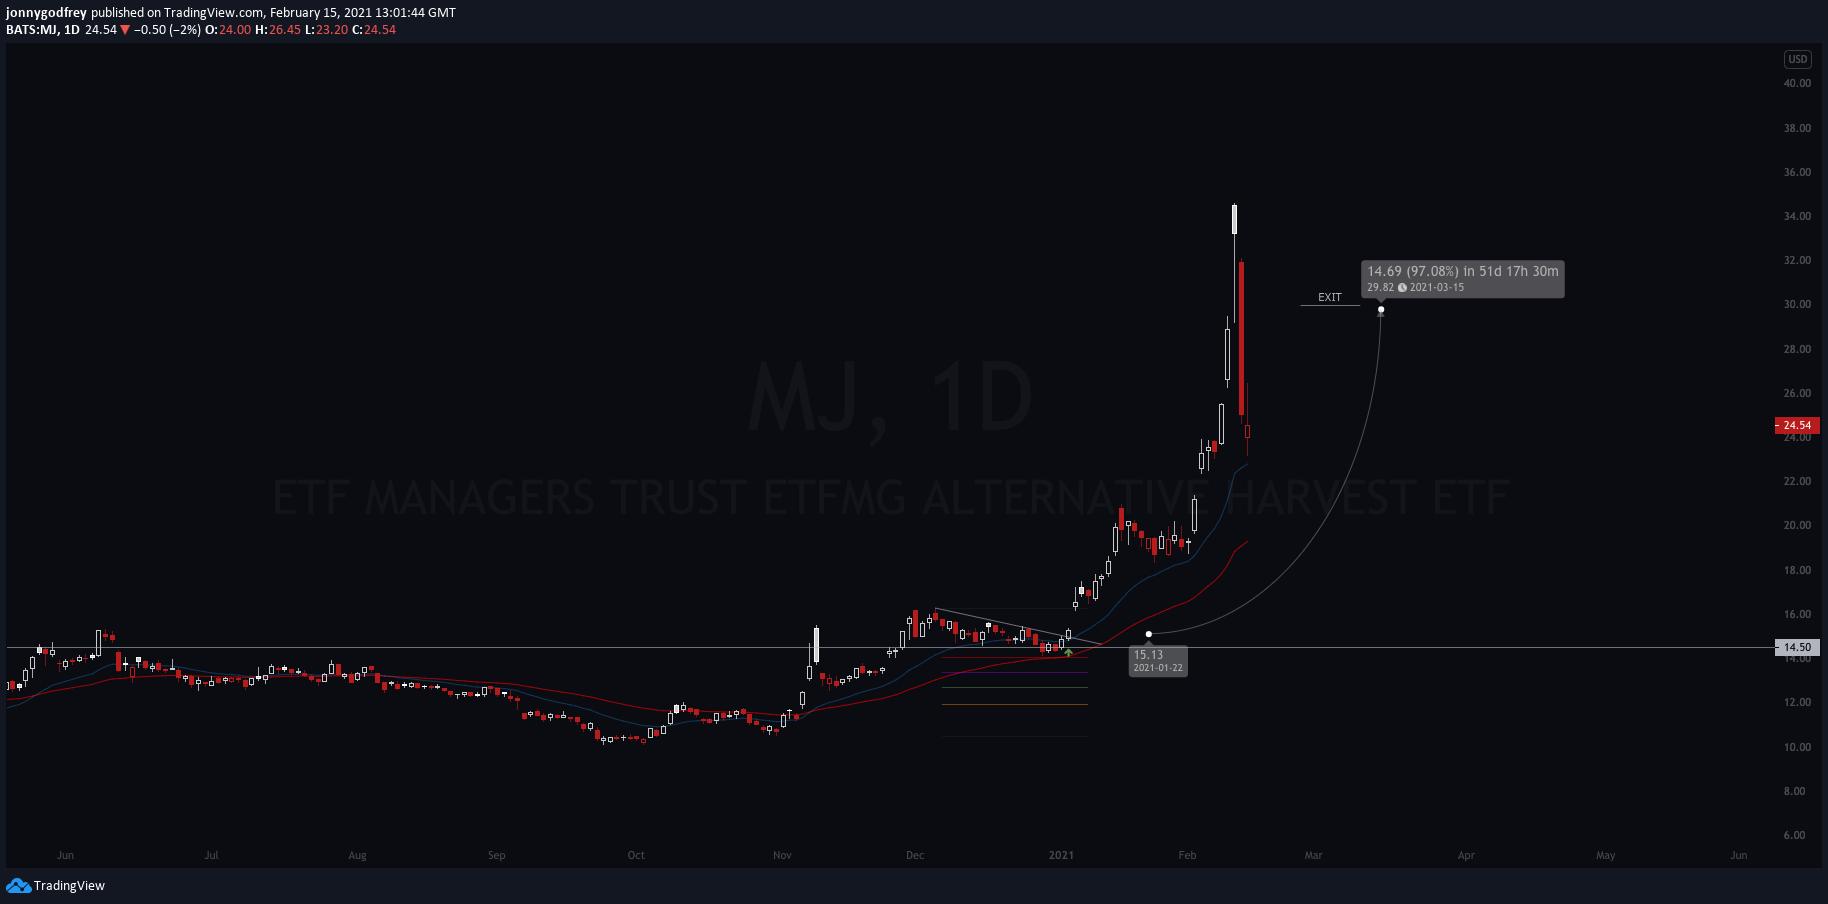 MJ daily chart